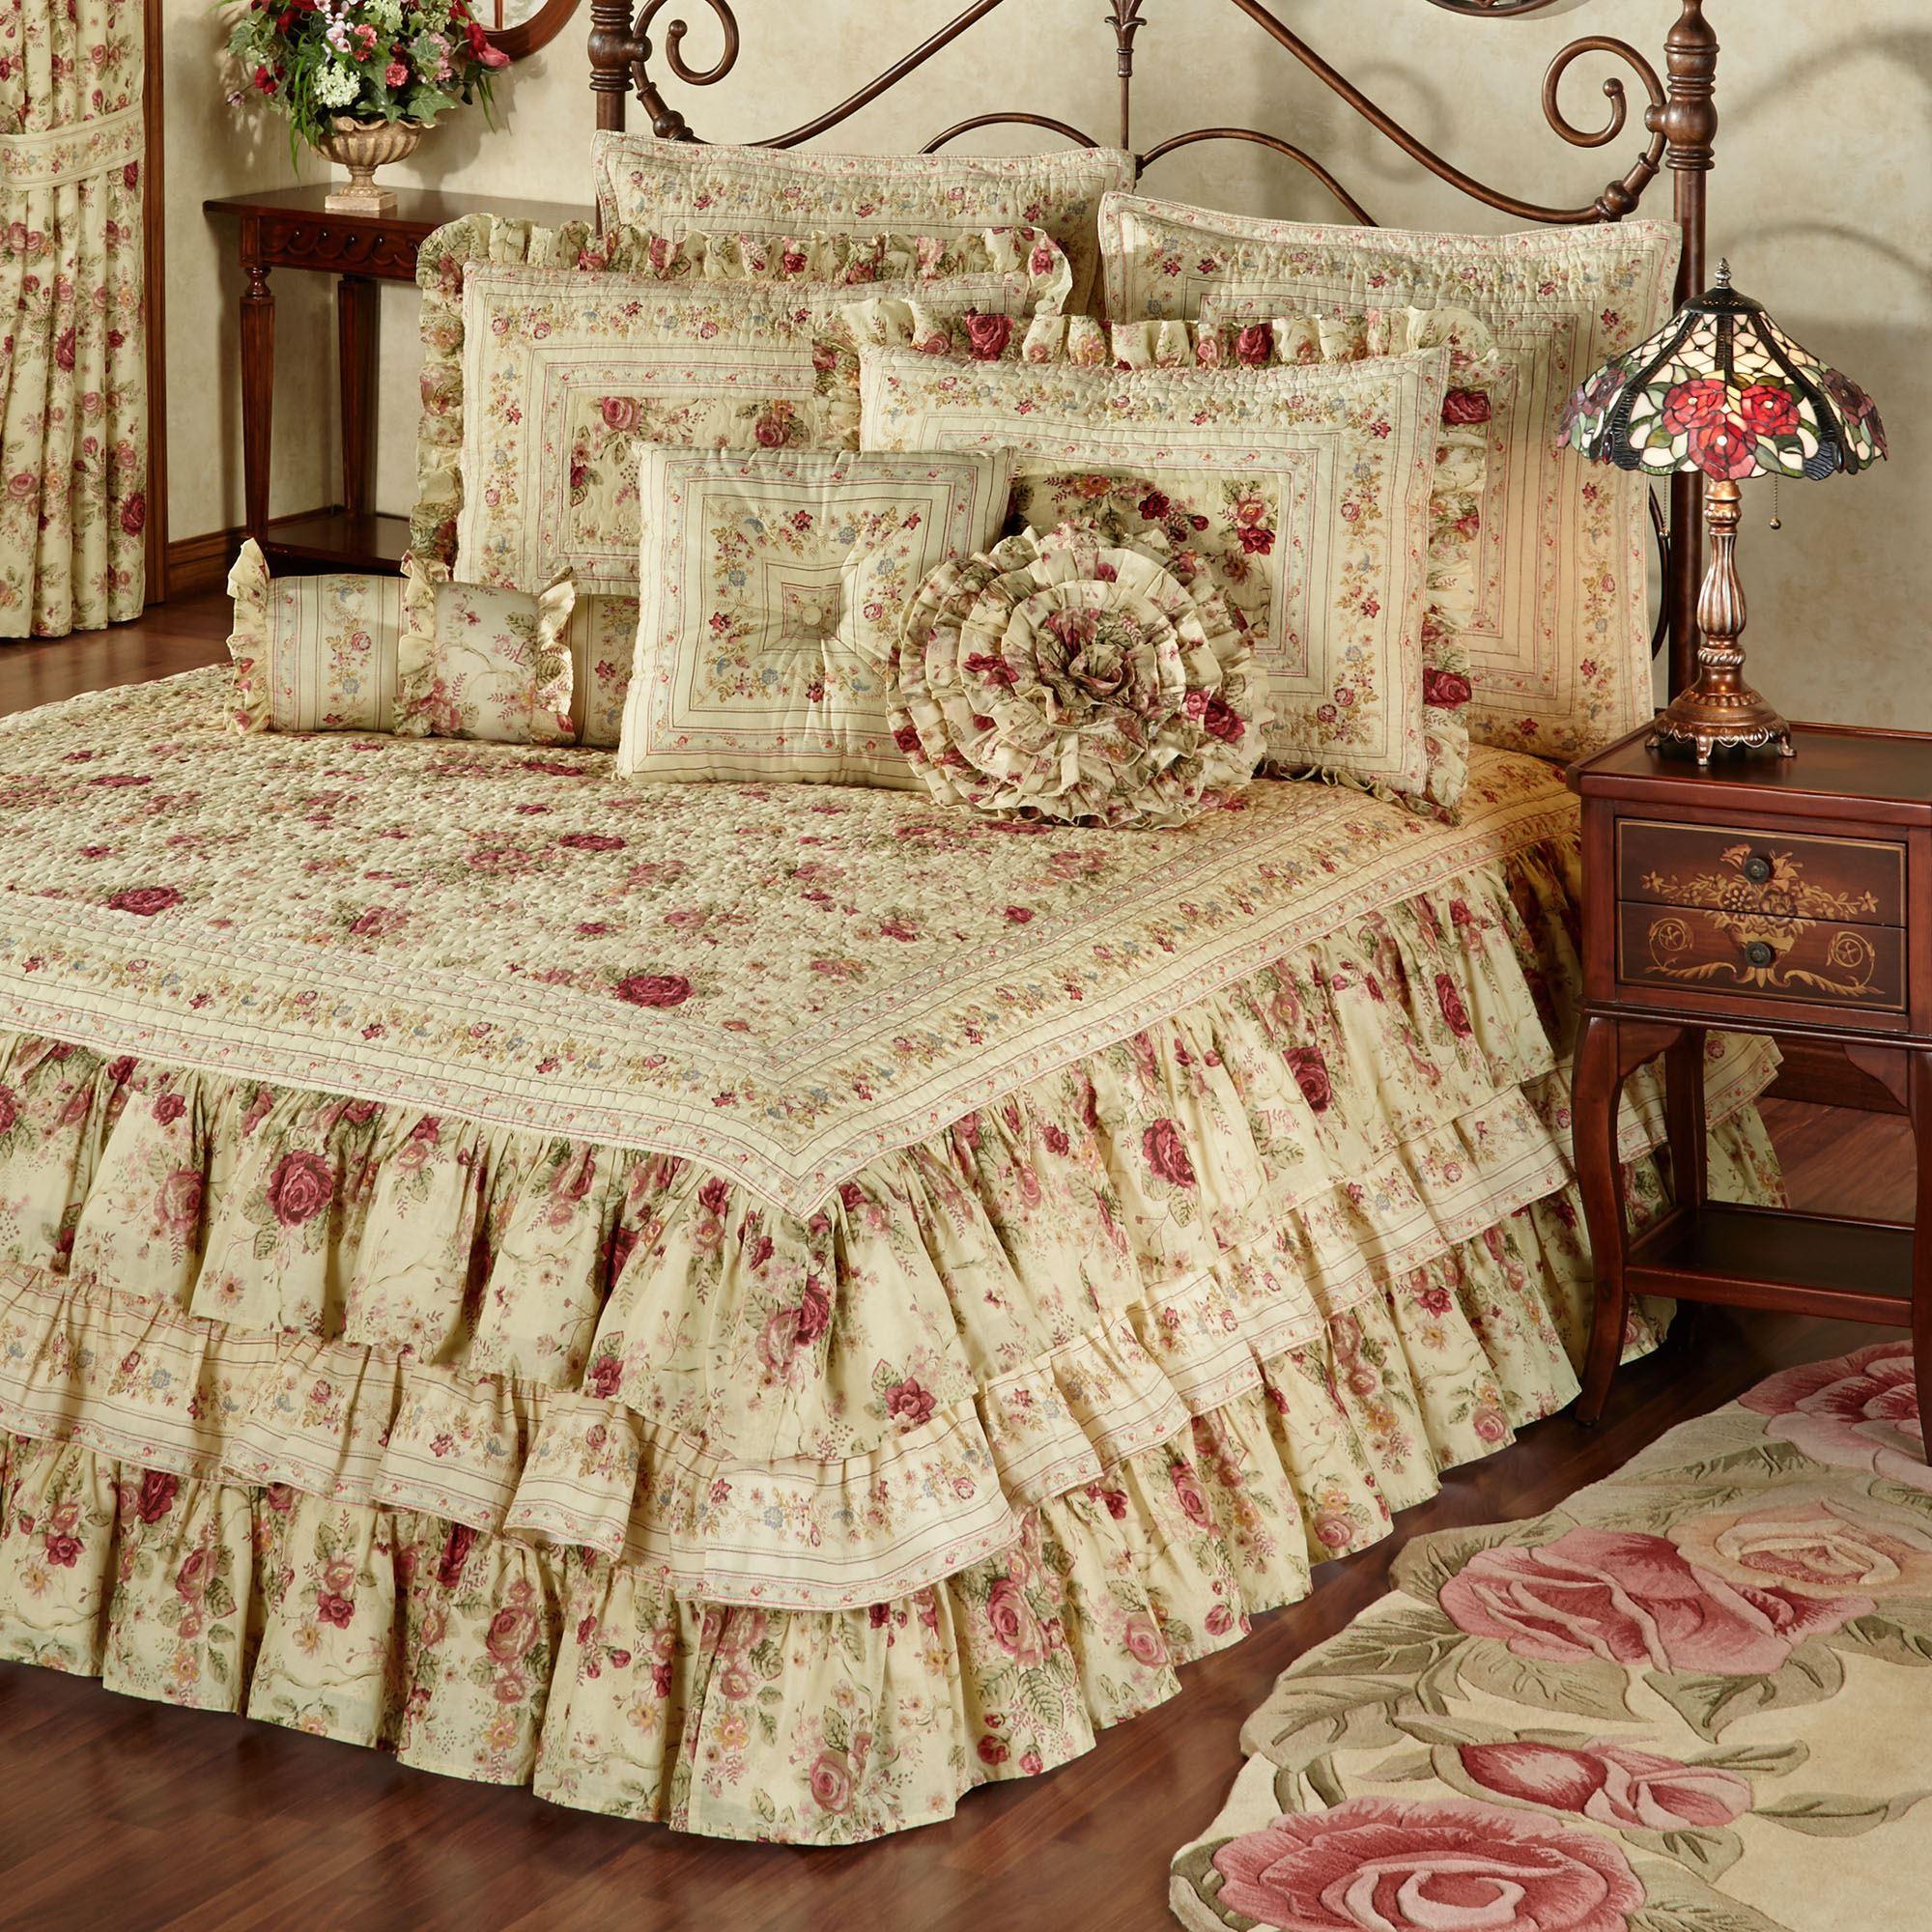 Excellent Bedrooms with Vintage touch Vintage Rose Floral Ruffled Grande Bedspread